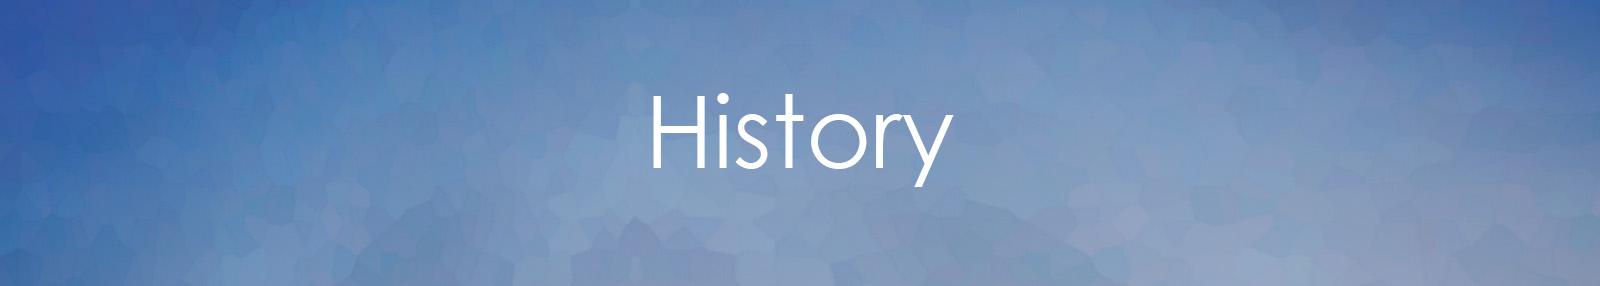 header_image_history